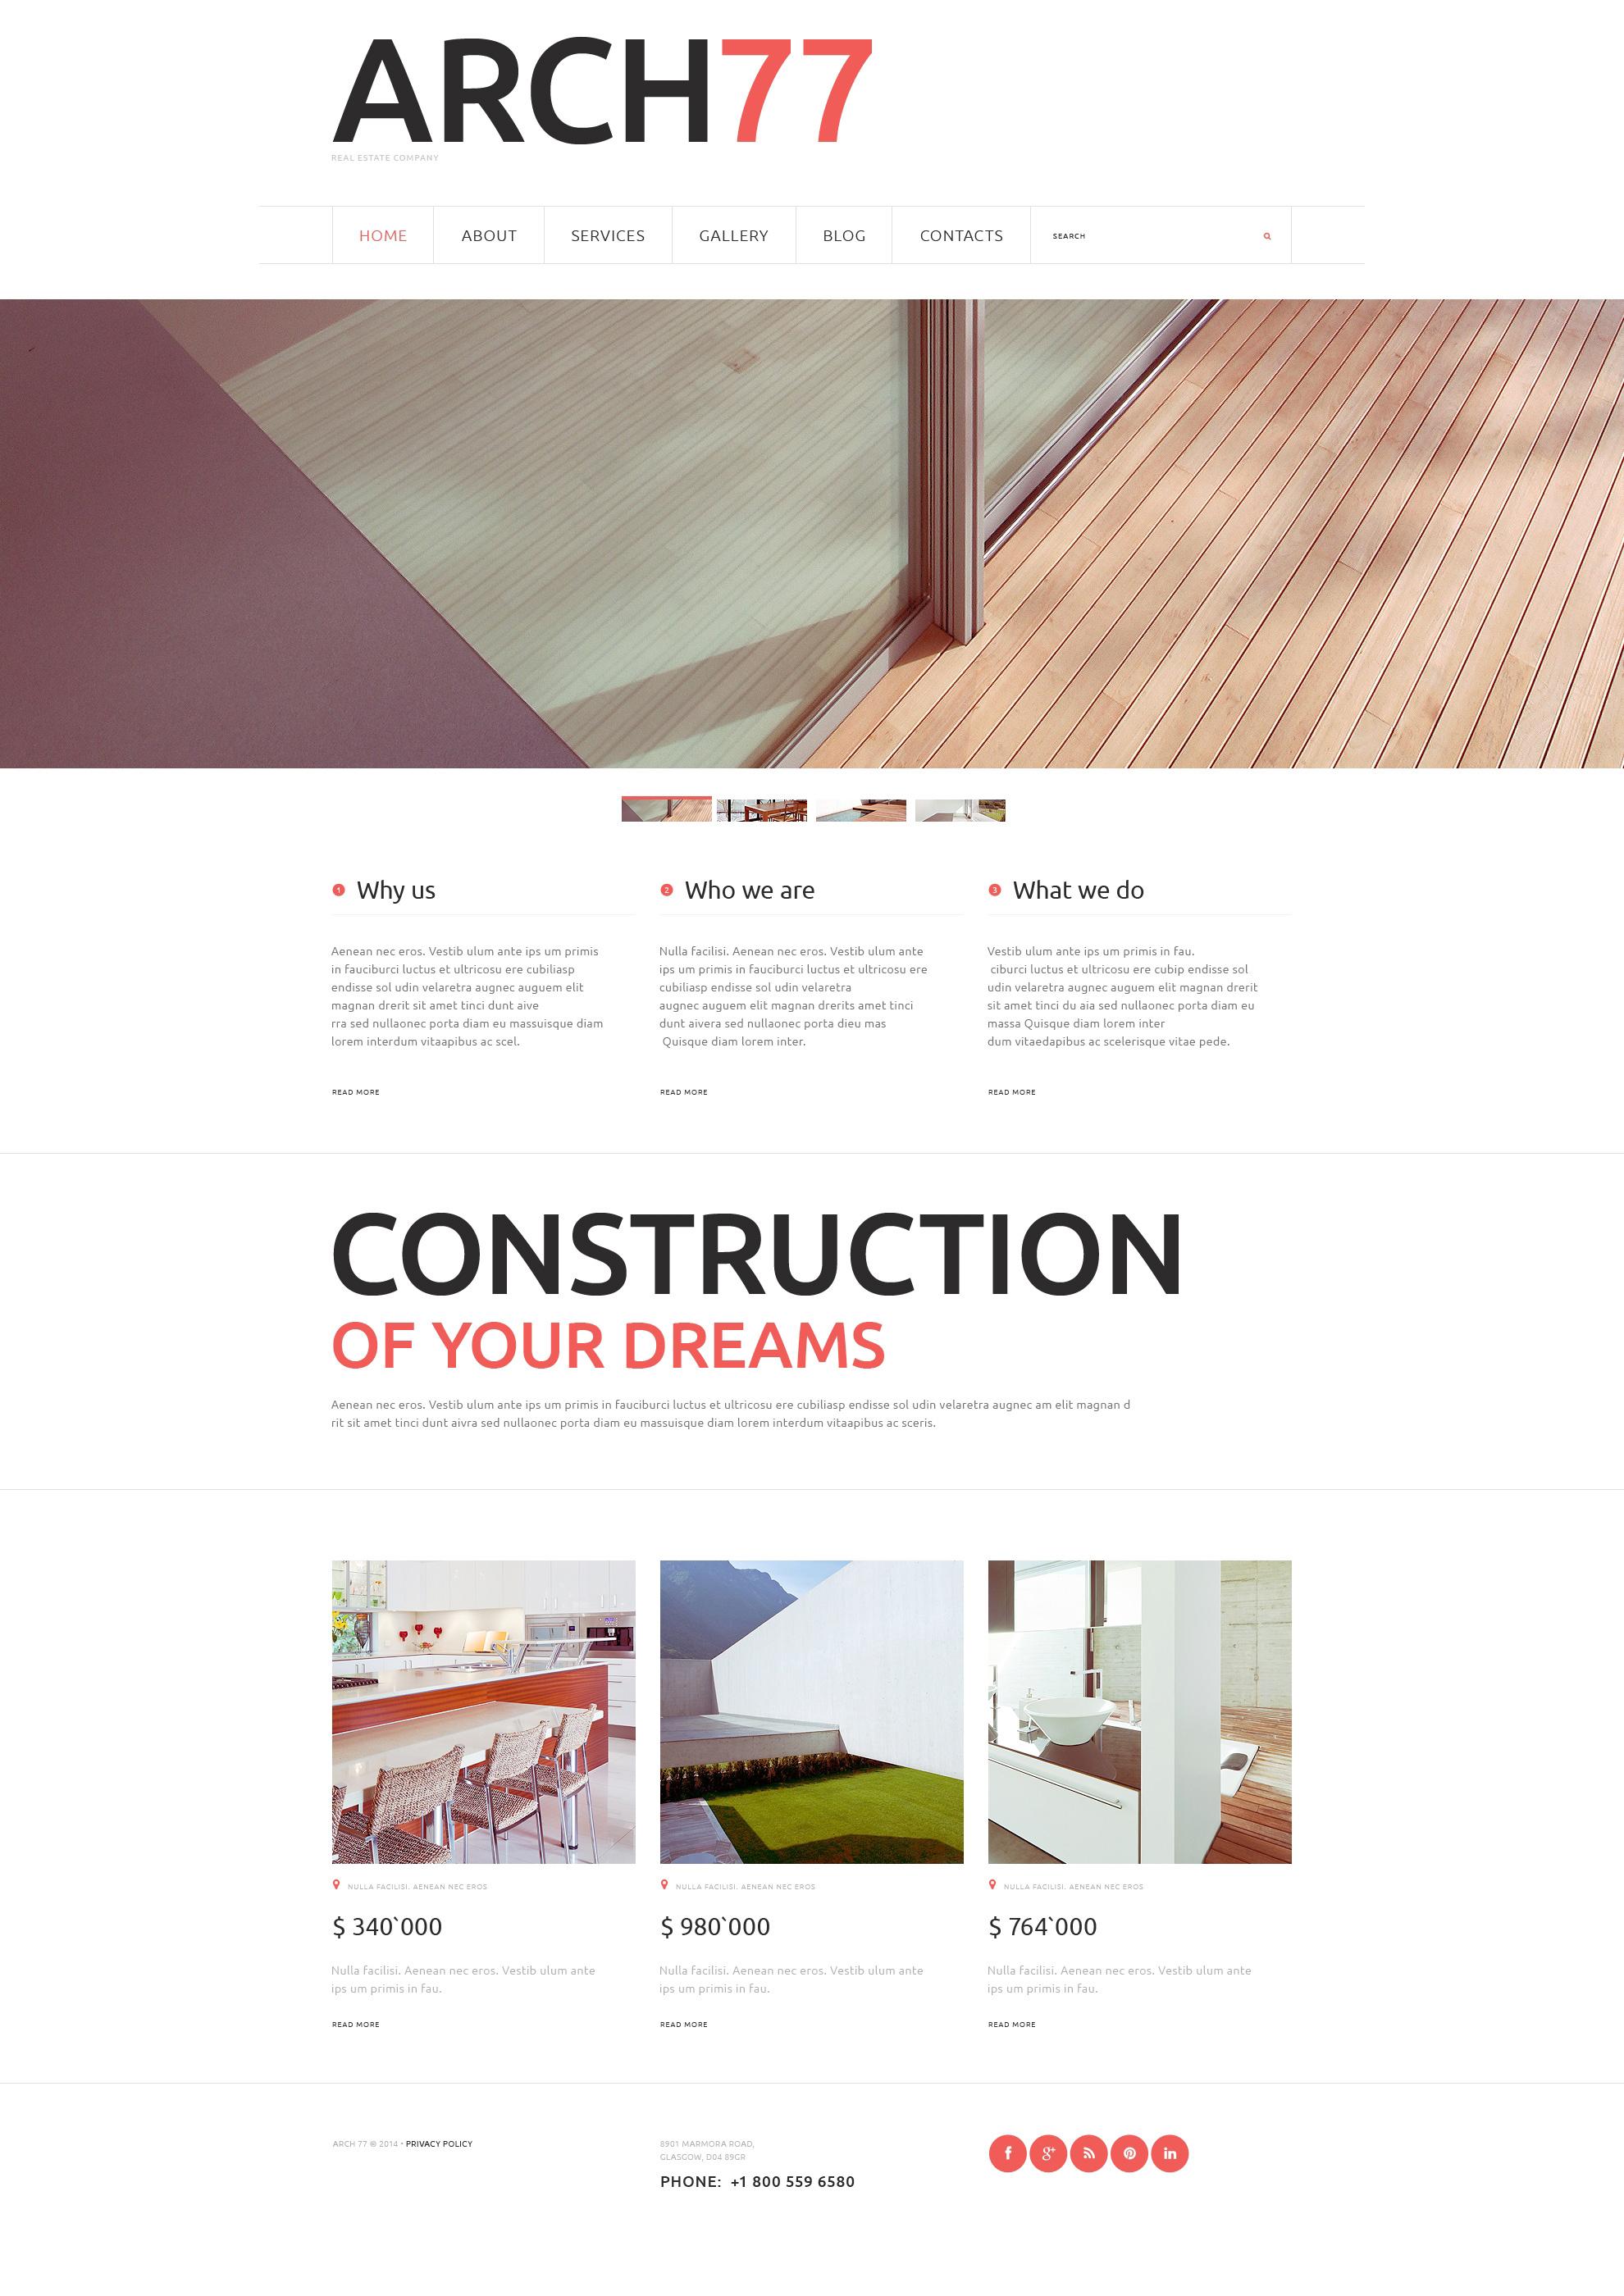 Responsywny szablon Joomla Architektura #49571 - zrzut ekranu